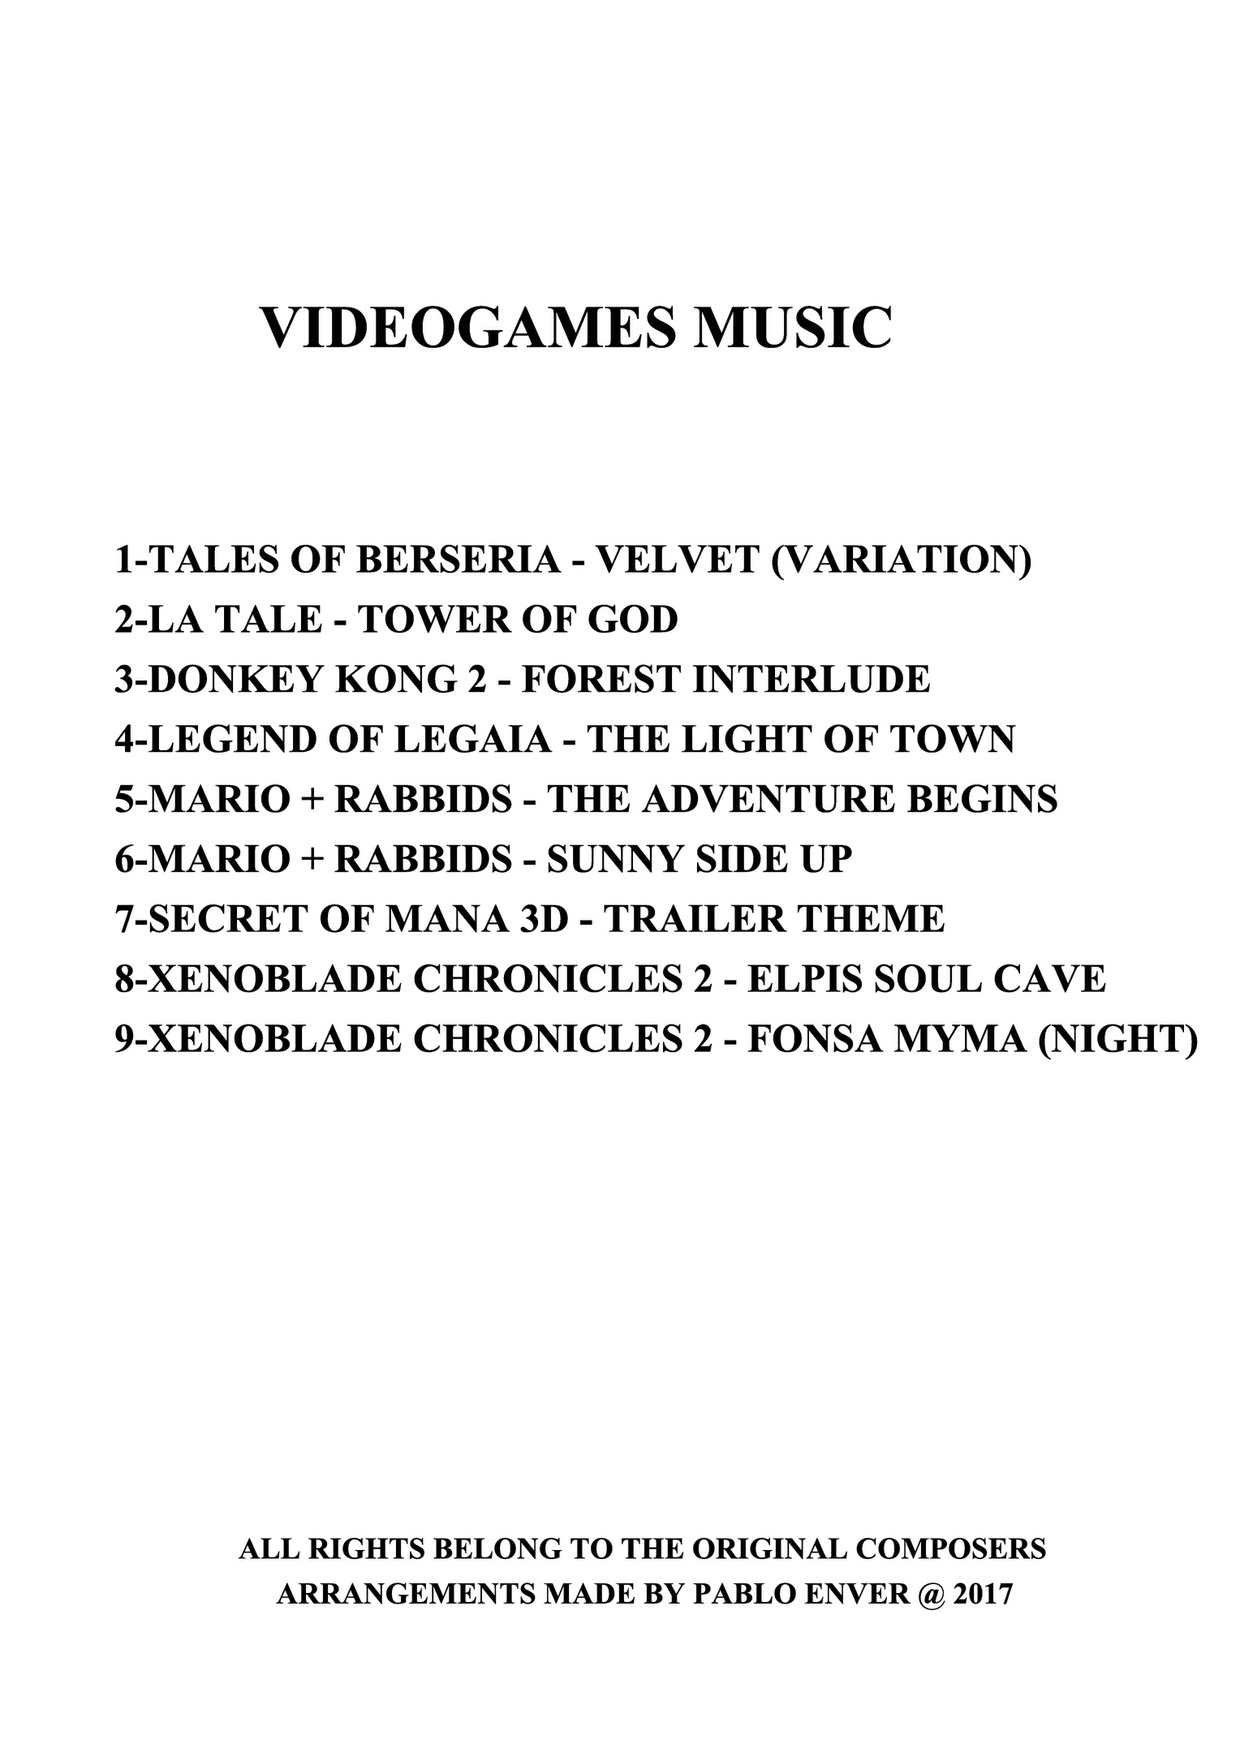 VIDEOGAMES MUSIC 2017